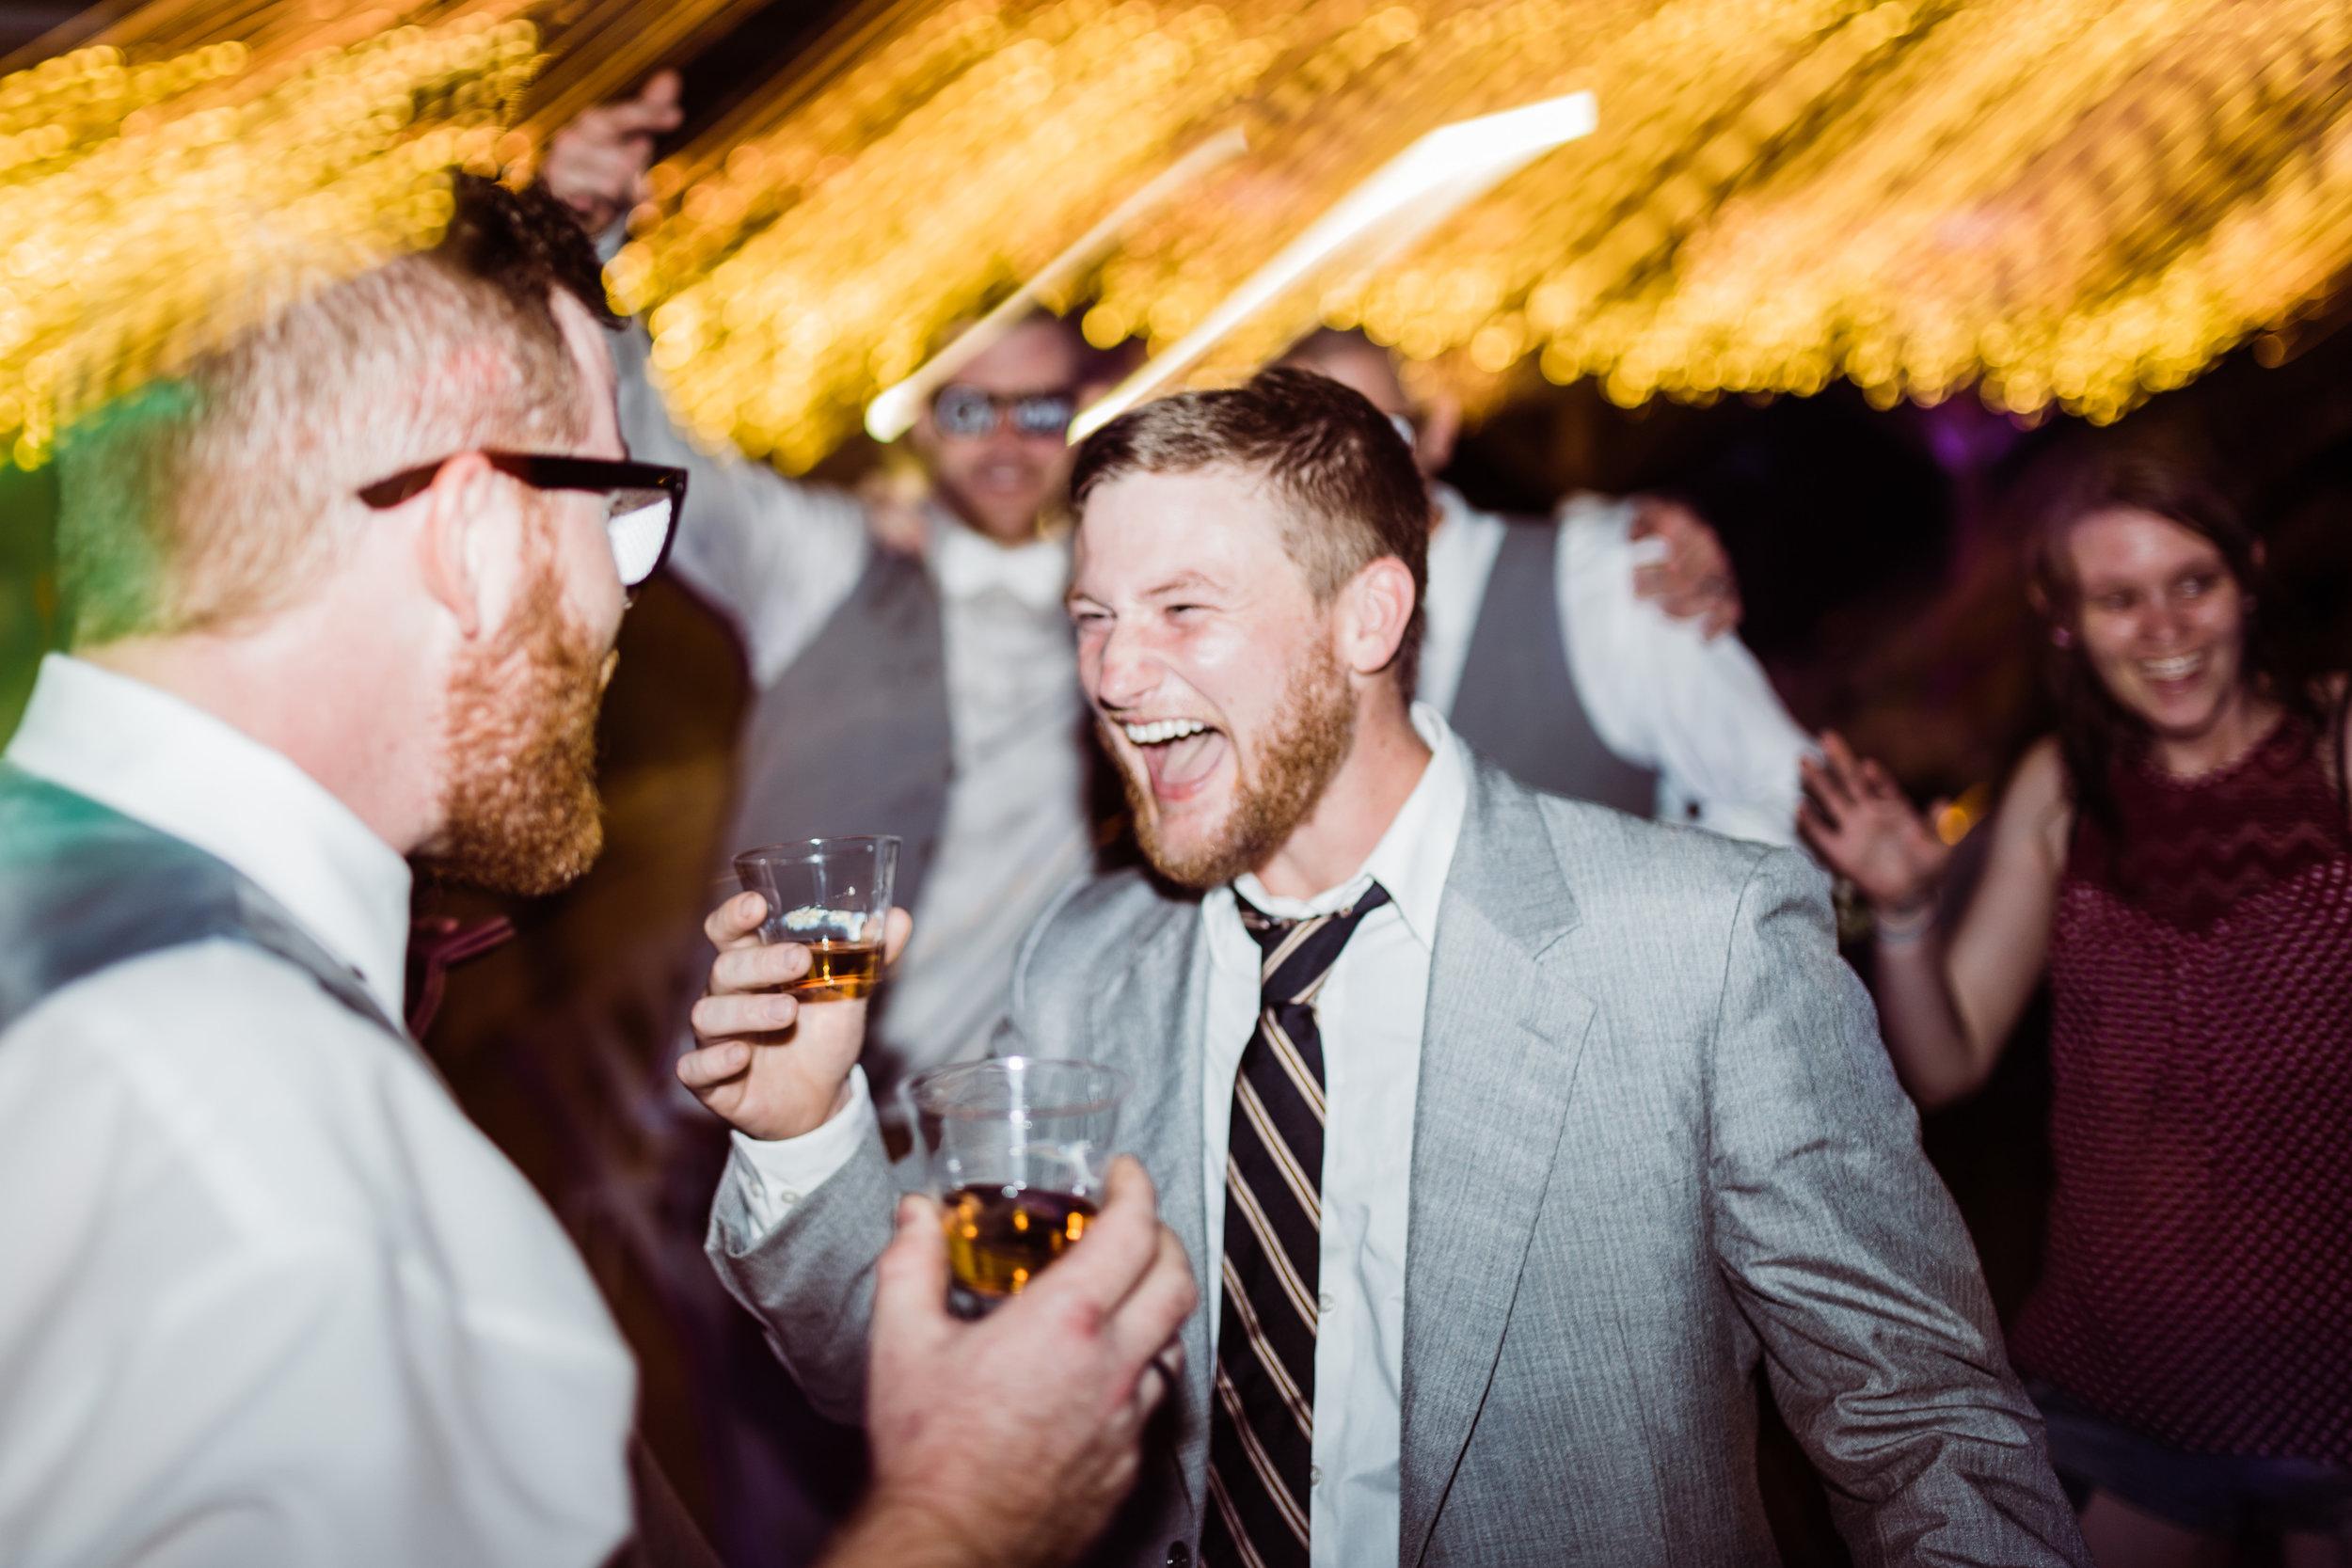 2017.10.14 Samantha and Matthew Crabtree Sarasota Wedding (646 of 708).jpg